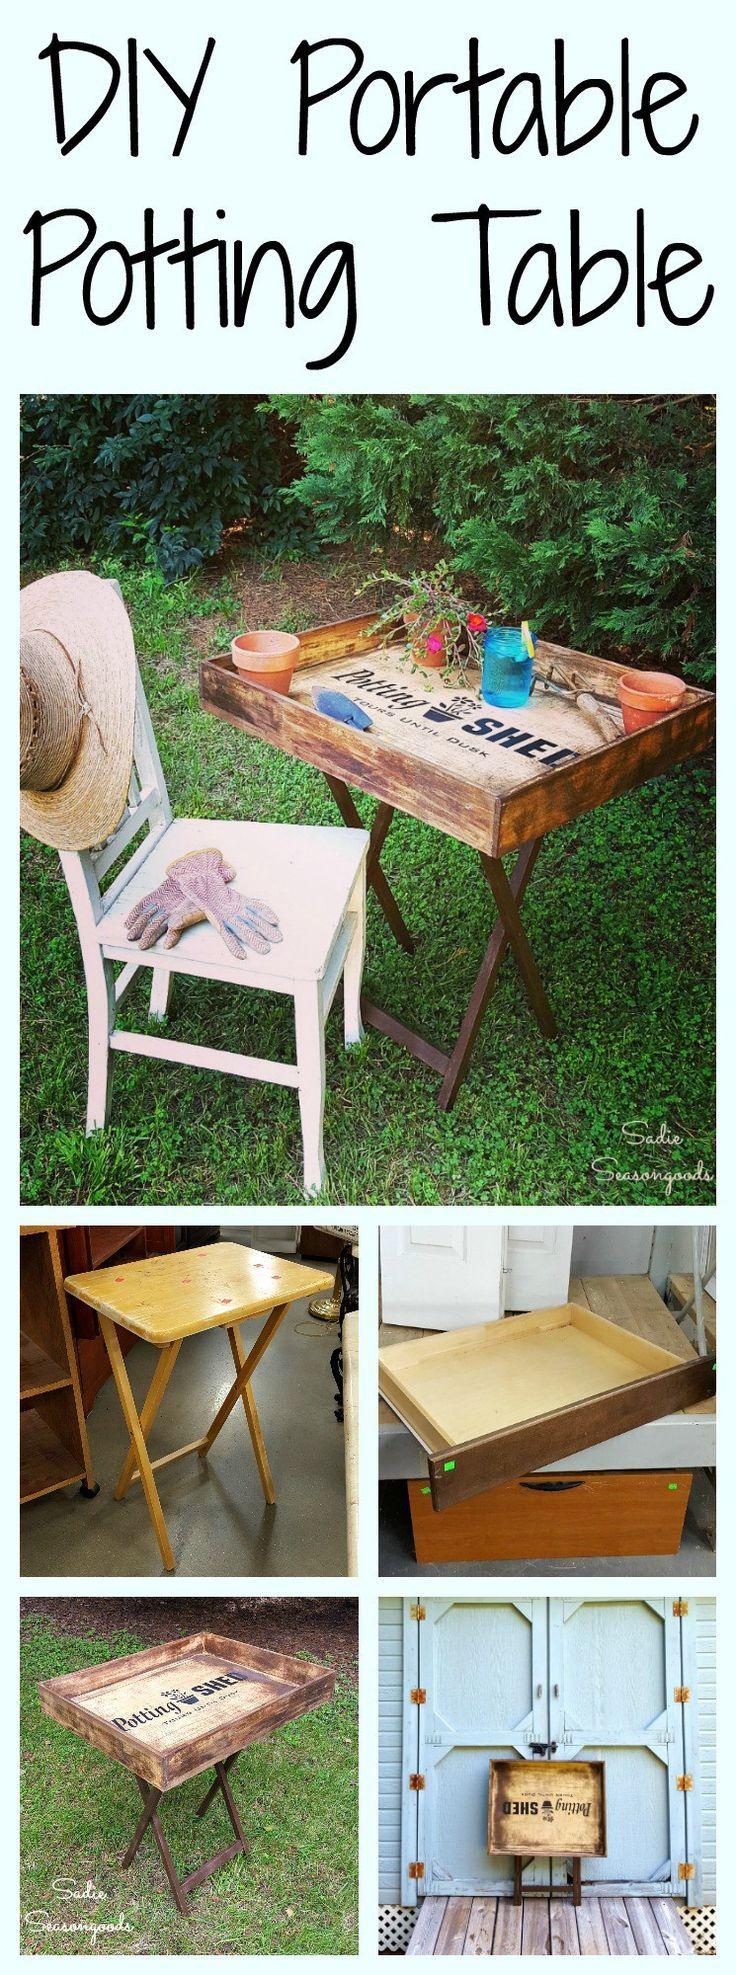 DIY Portable Potting Bench for Small Living